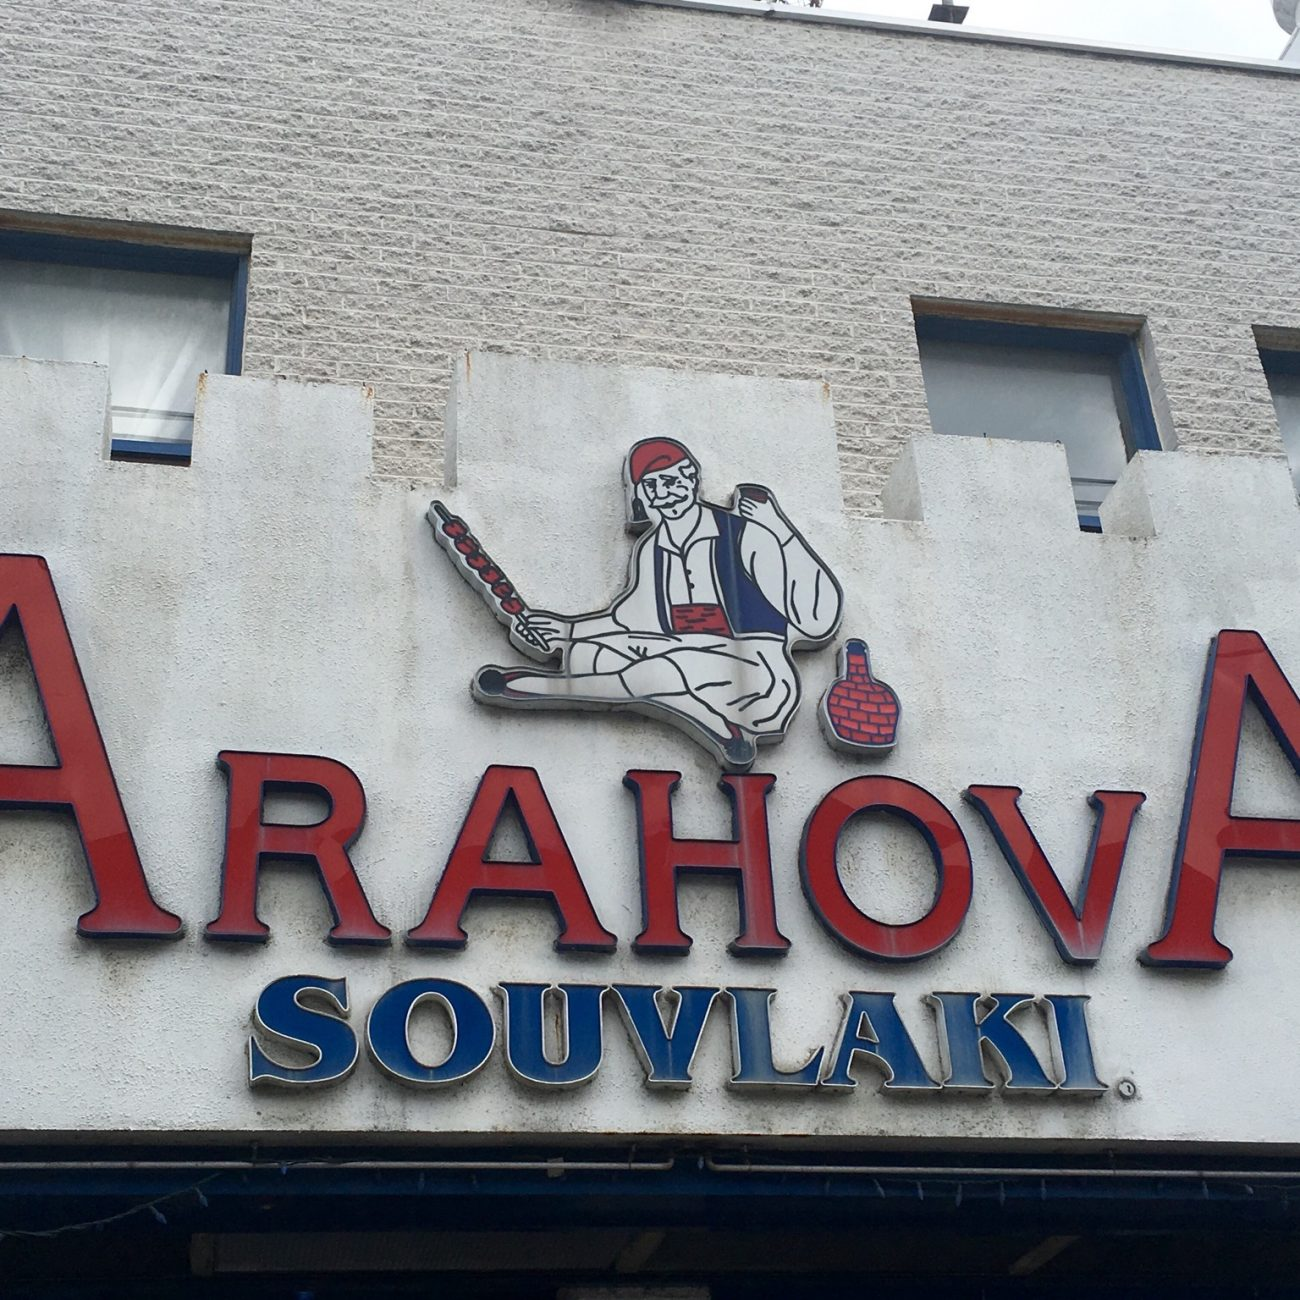 Arahova